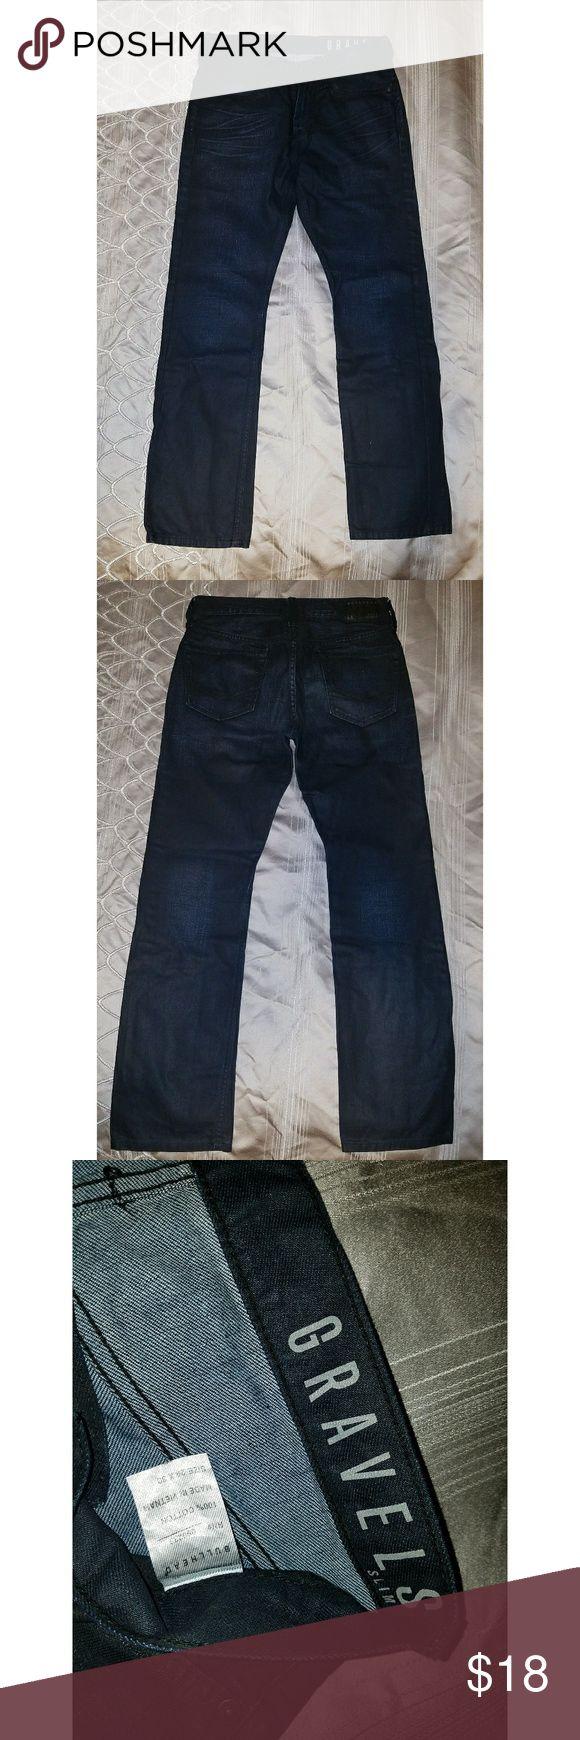 Bullhead Slim Fit Raw Denim in Dark Indigo Rock out in these classic Raw Denim Jeans from the Bullhead Gravels collection. Dark Indigo and Slim fit, W29 x L30. Very Gently used. Bullhead Jeans Slim